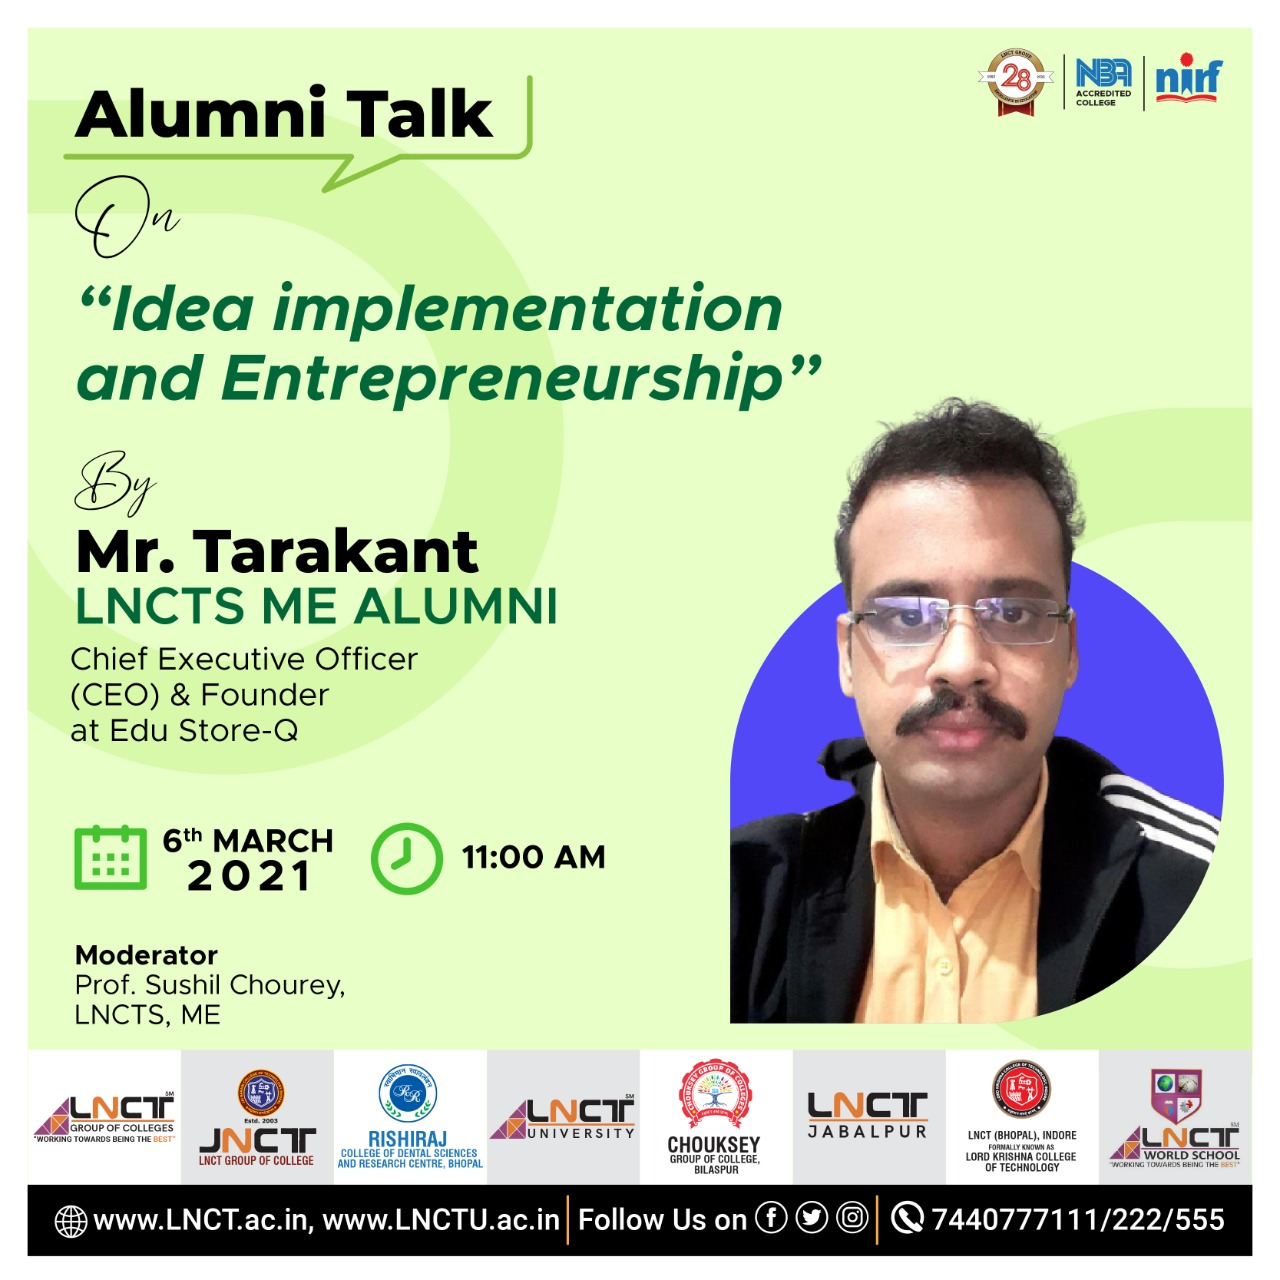 Alumni Talk | Idea Implementation and Entrepreneurship by Mr.Tarakant (CEO & Founder) at Edu Store-Q 1